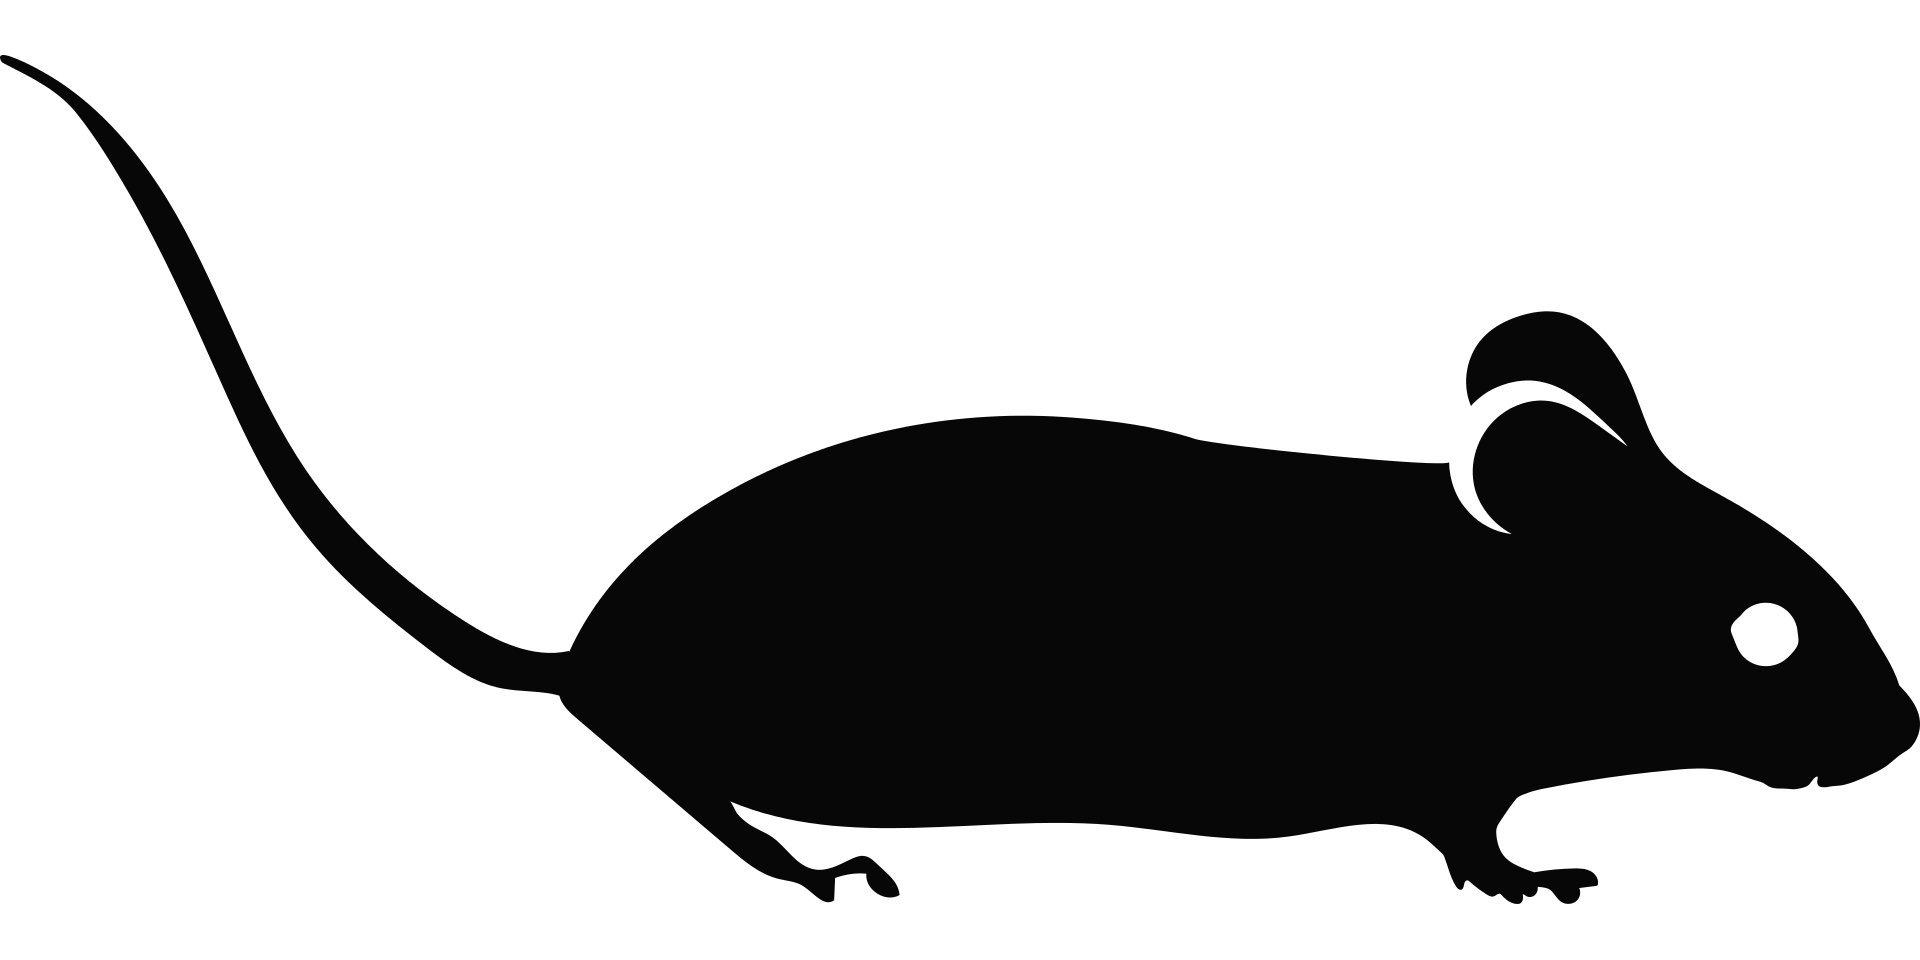 Experimental Alzheimer's drug improves memory in mice